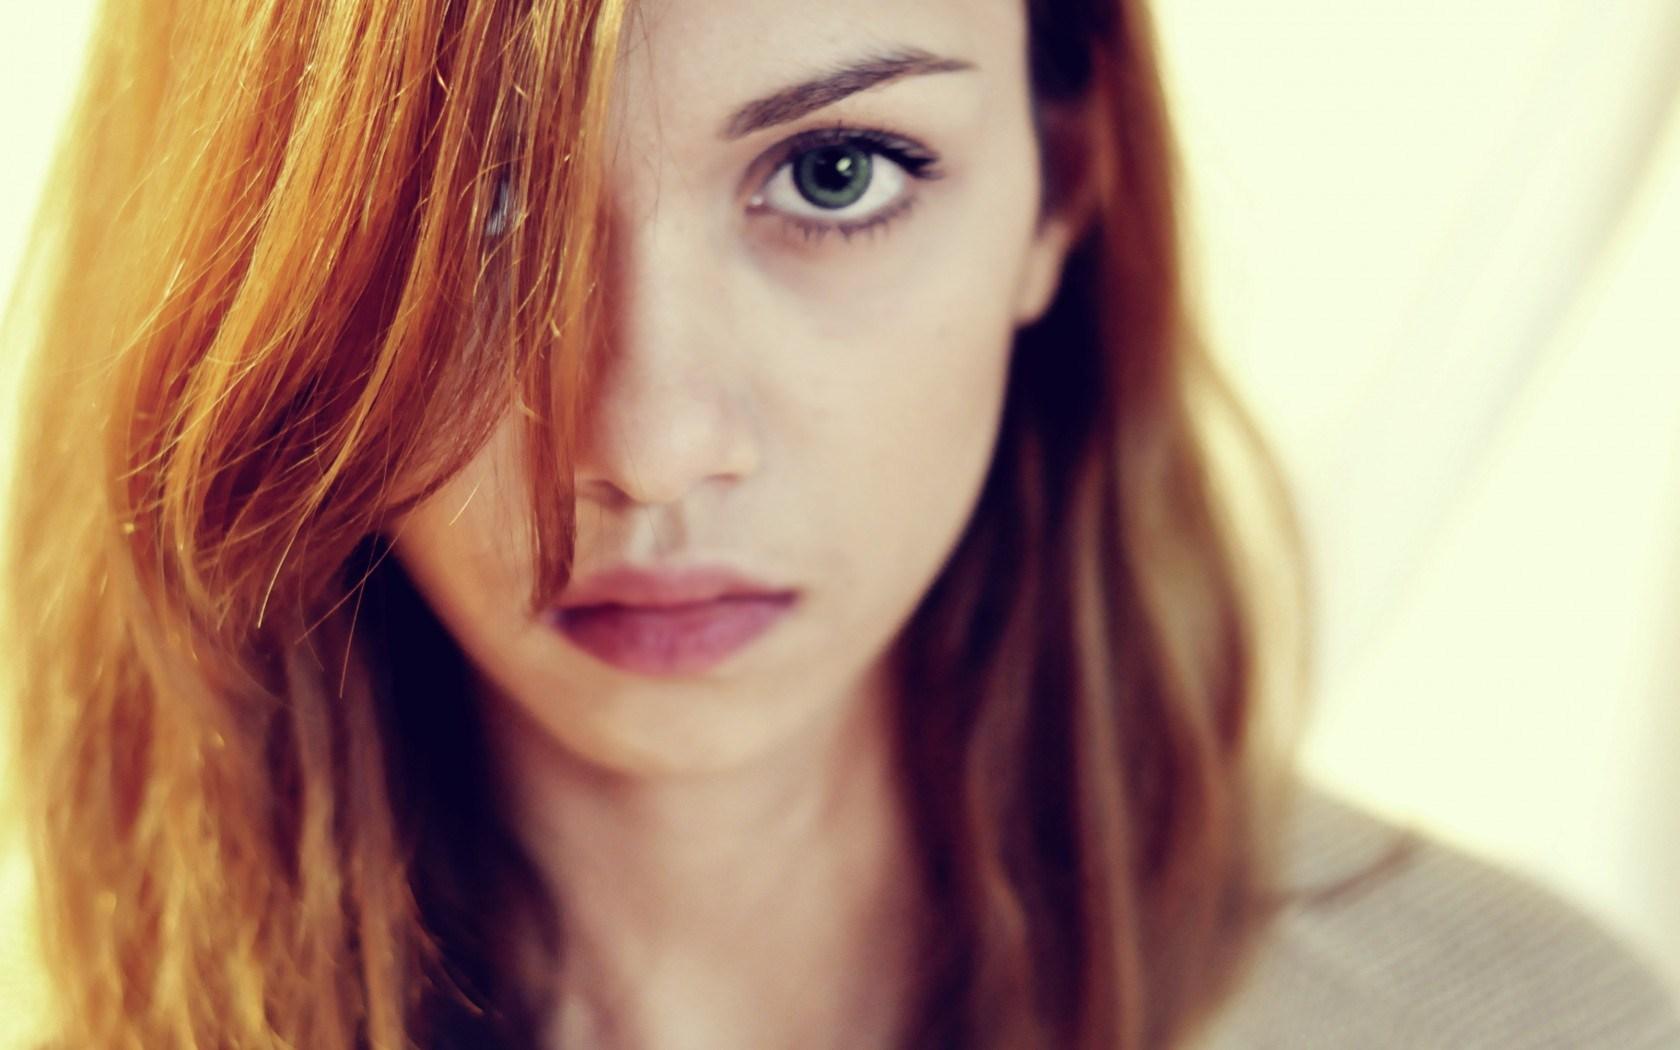 Girl Look Close-Up Portrait